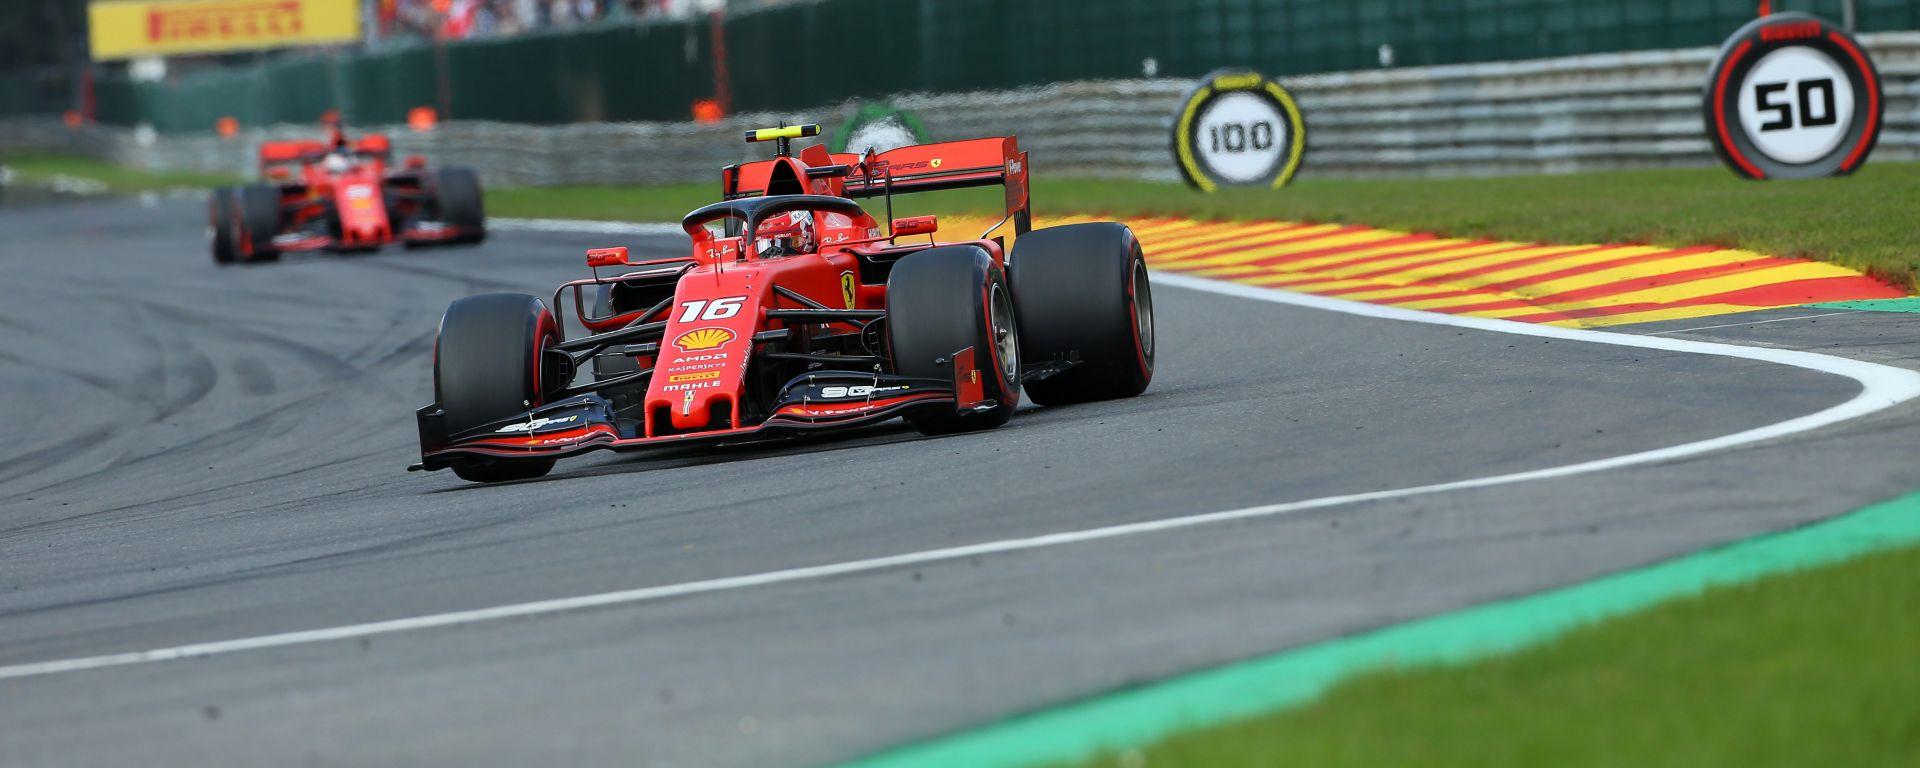 F1 GP Belgio 2019, Charles Leclerc (Ferrari) nei primi giri di gara a Spa-Francorchamps